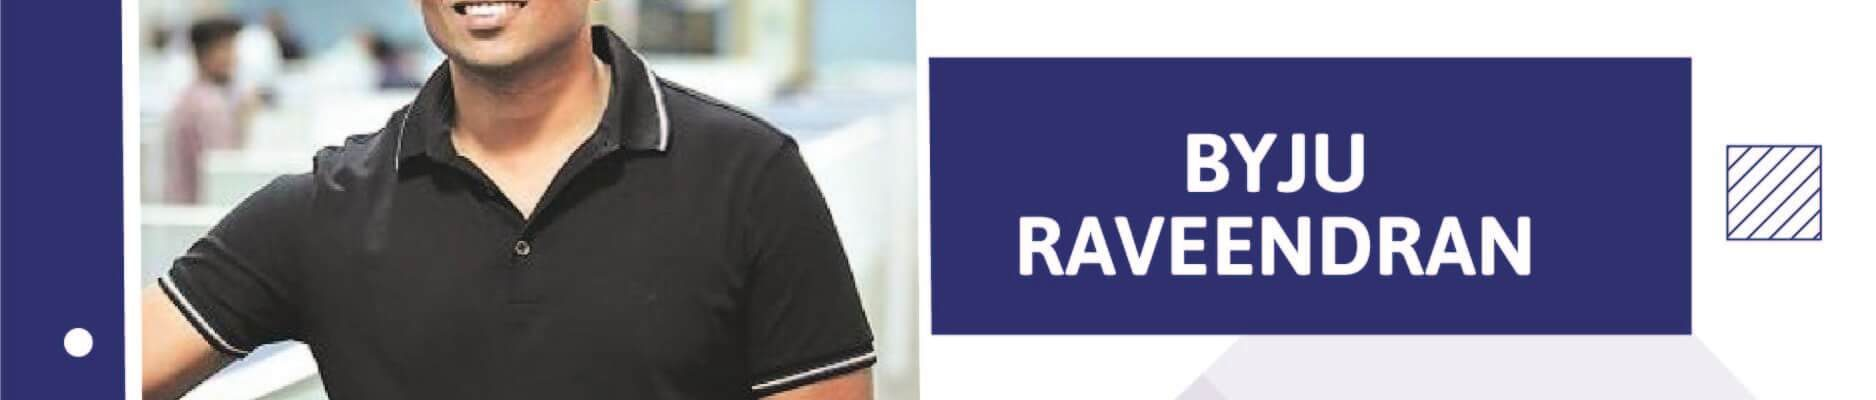 Bjyu raveendran